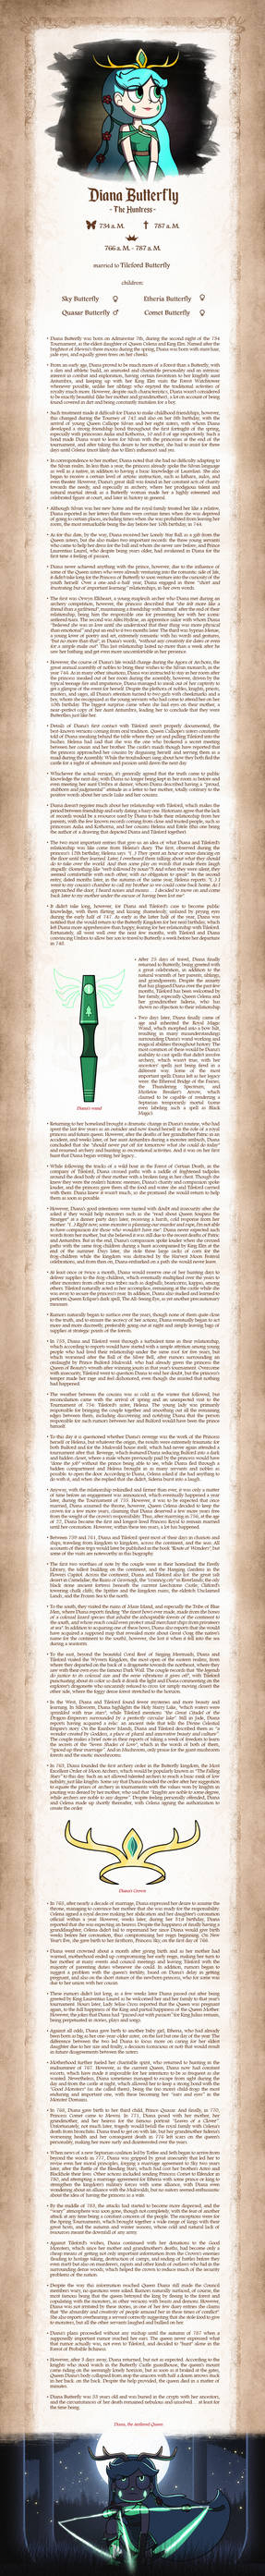 Diana the Huntress - Biography